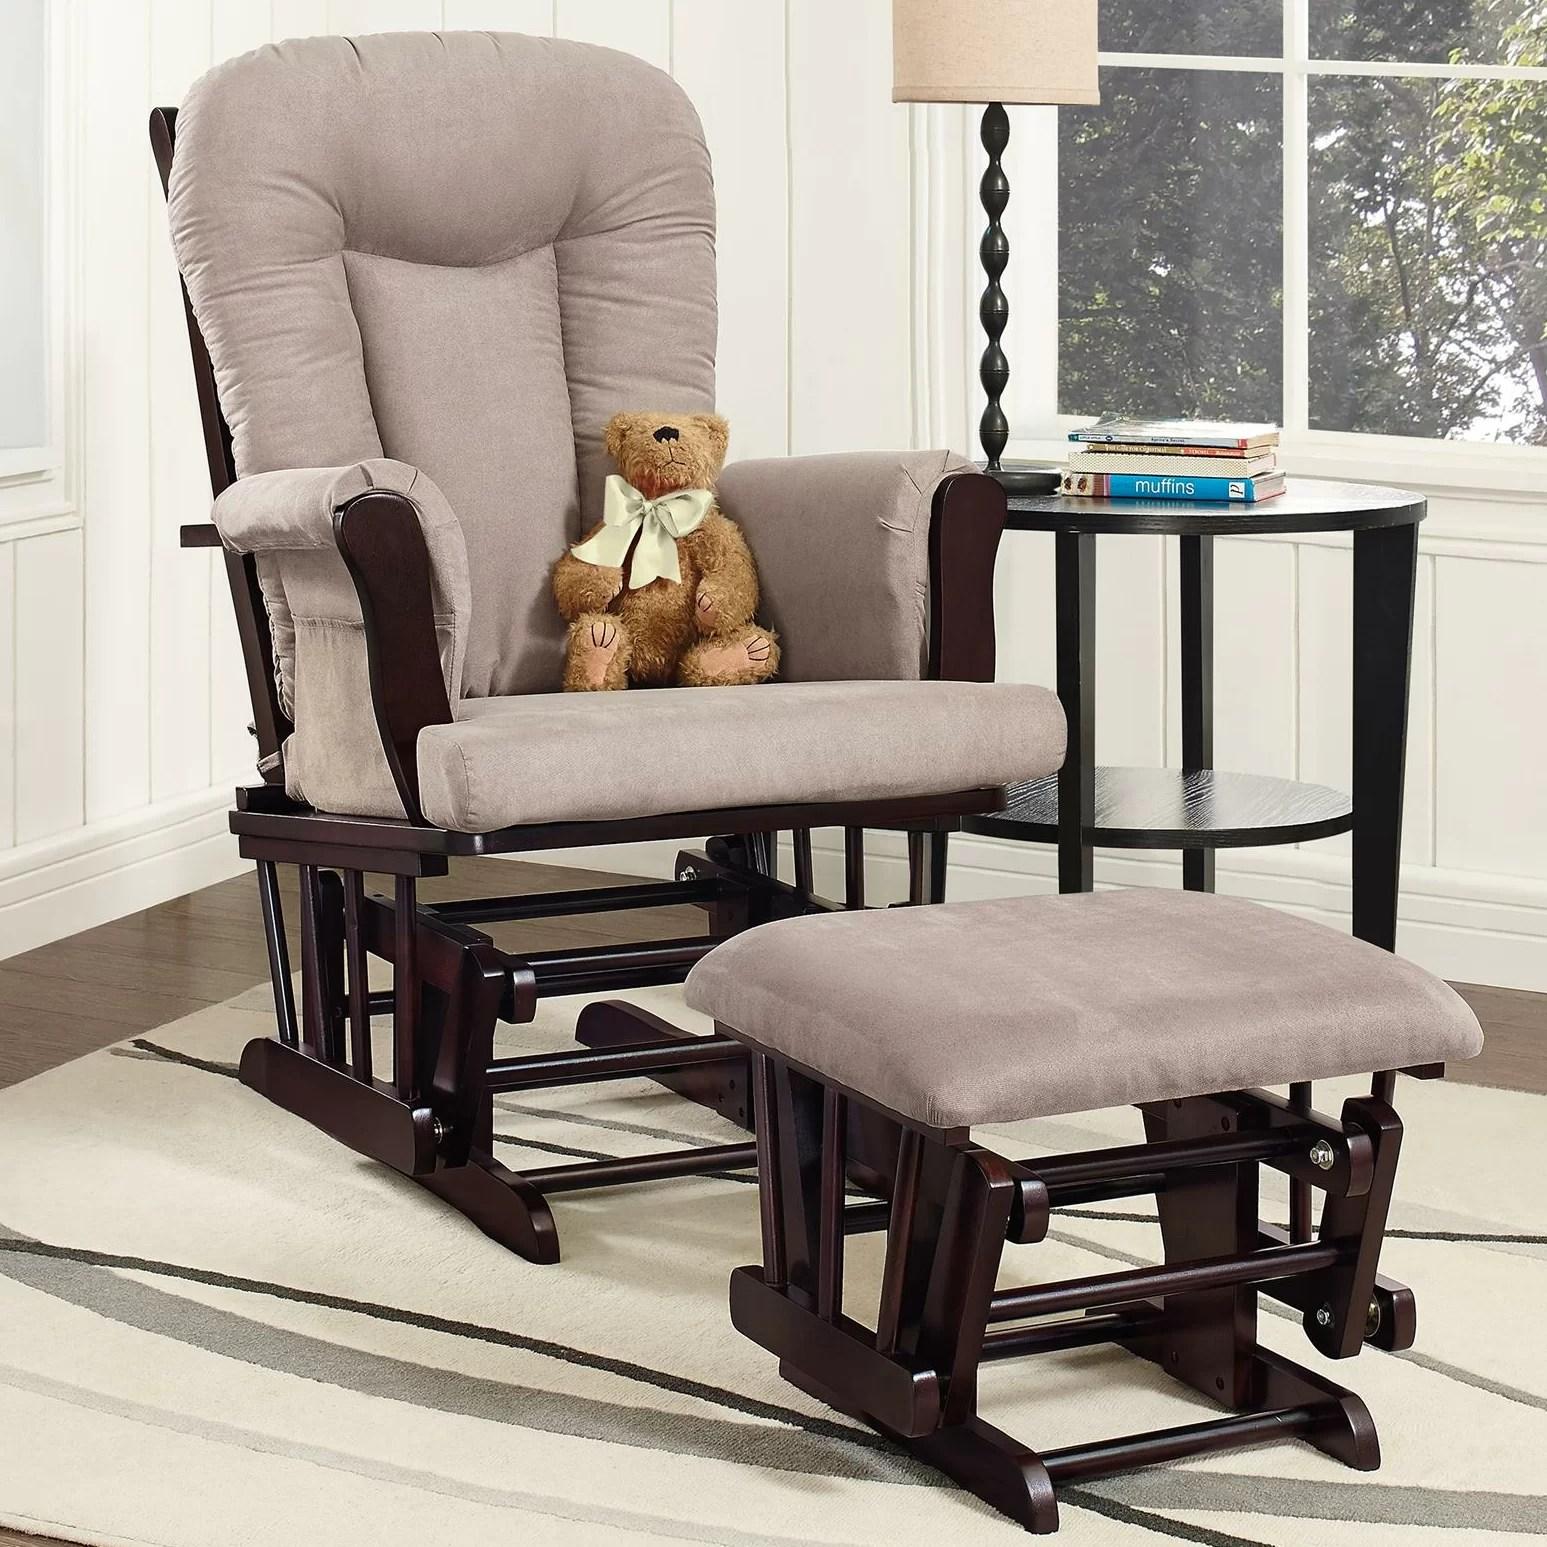 nursery rocker chair reviews first years high viv 43 rae lucien and ottoman wayfair